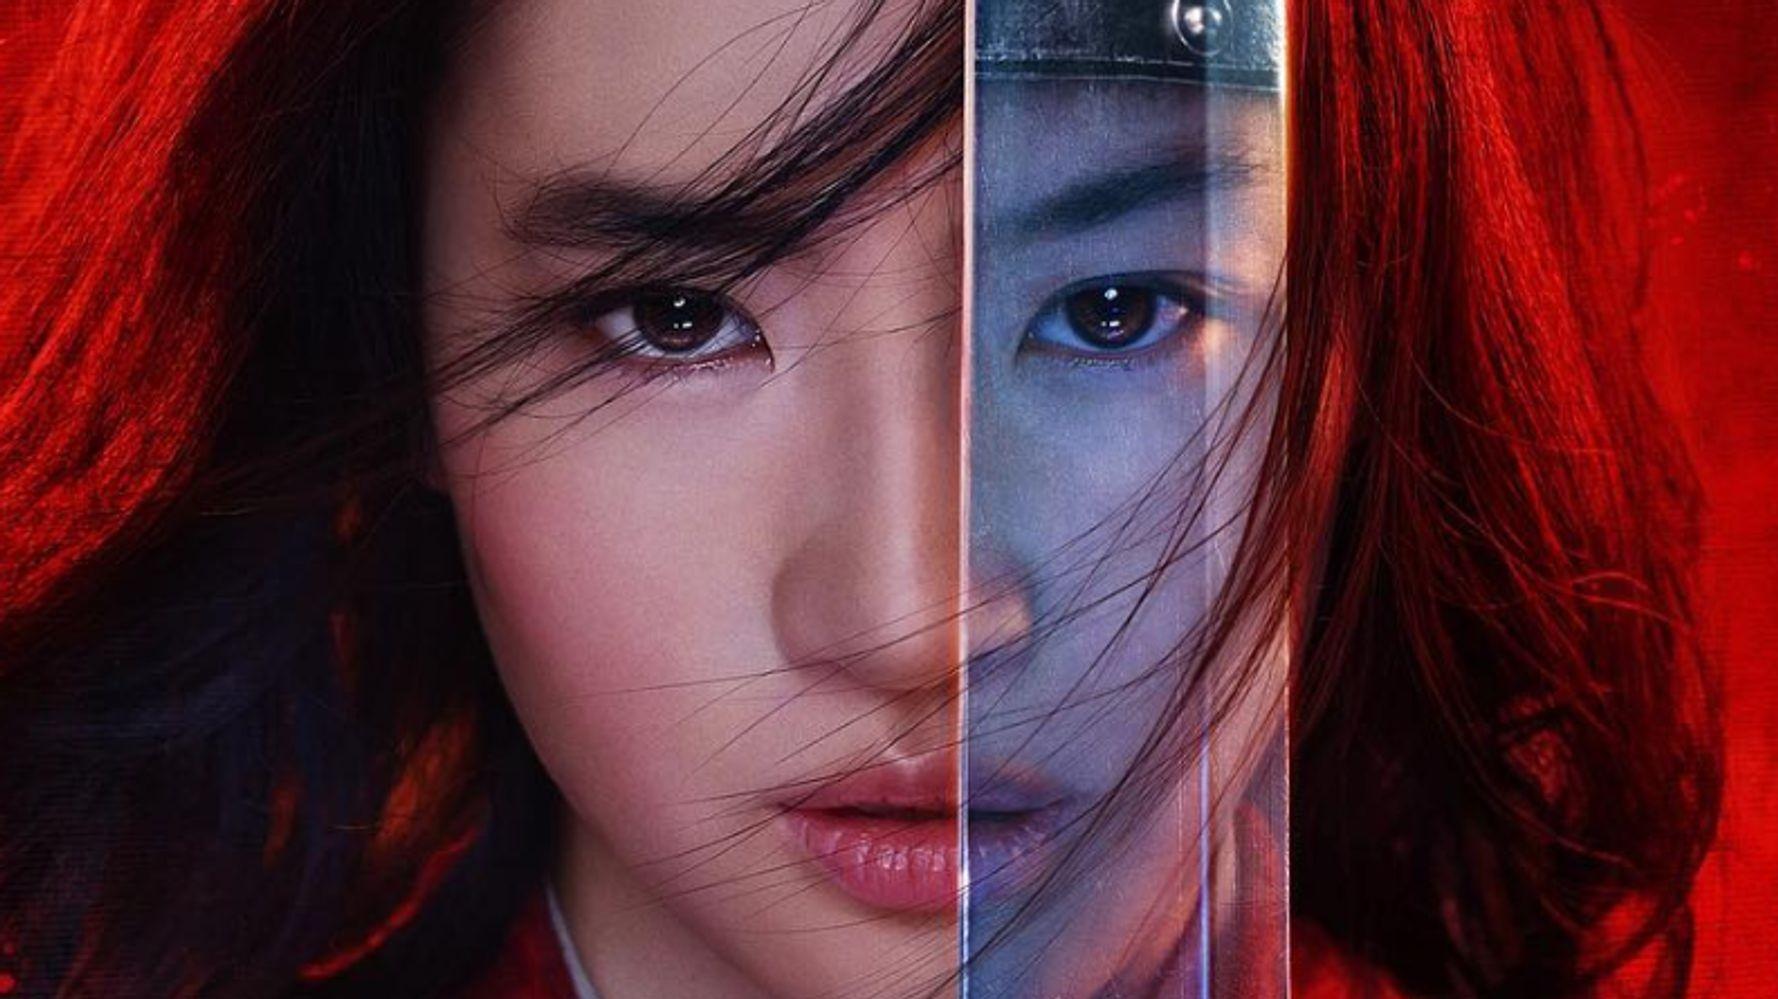 Disney's 1st 'Mulan' Trailer Divides Fans And Reignites #BoycottMulan Hashtag